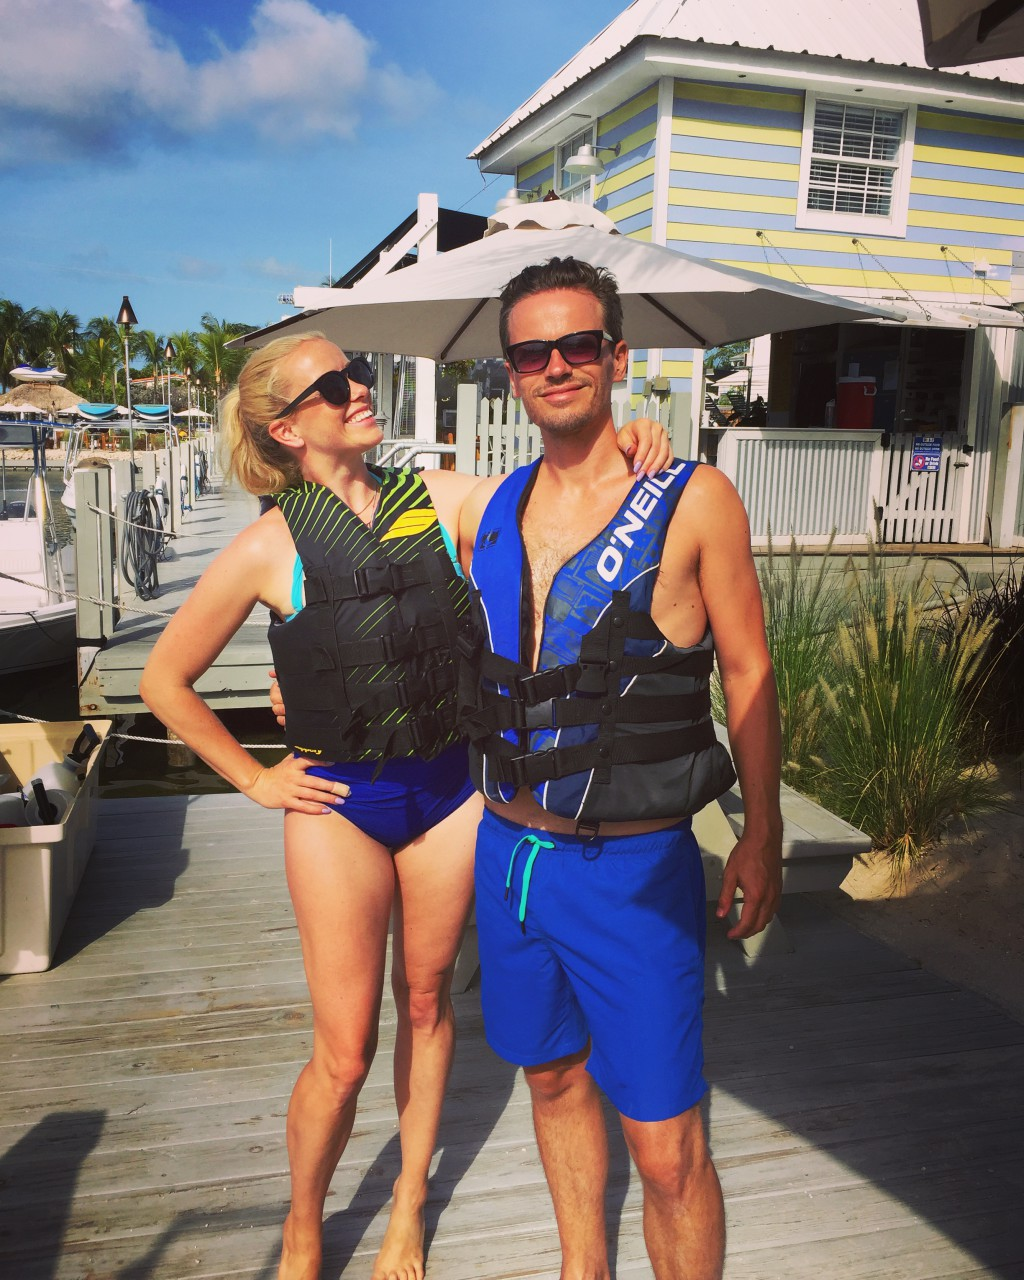 Vannscooter moro i Key West reisetips florida reiseblogger merete gamst positivista